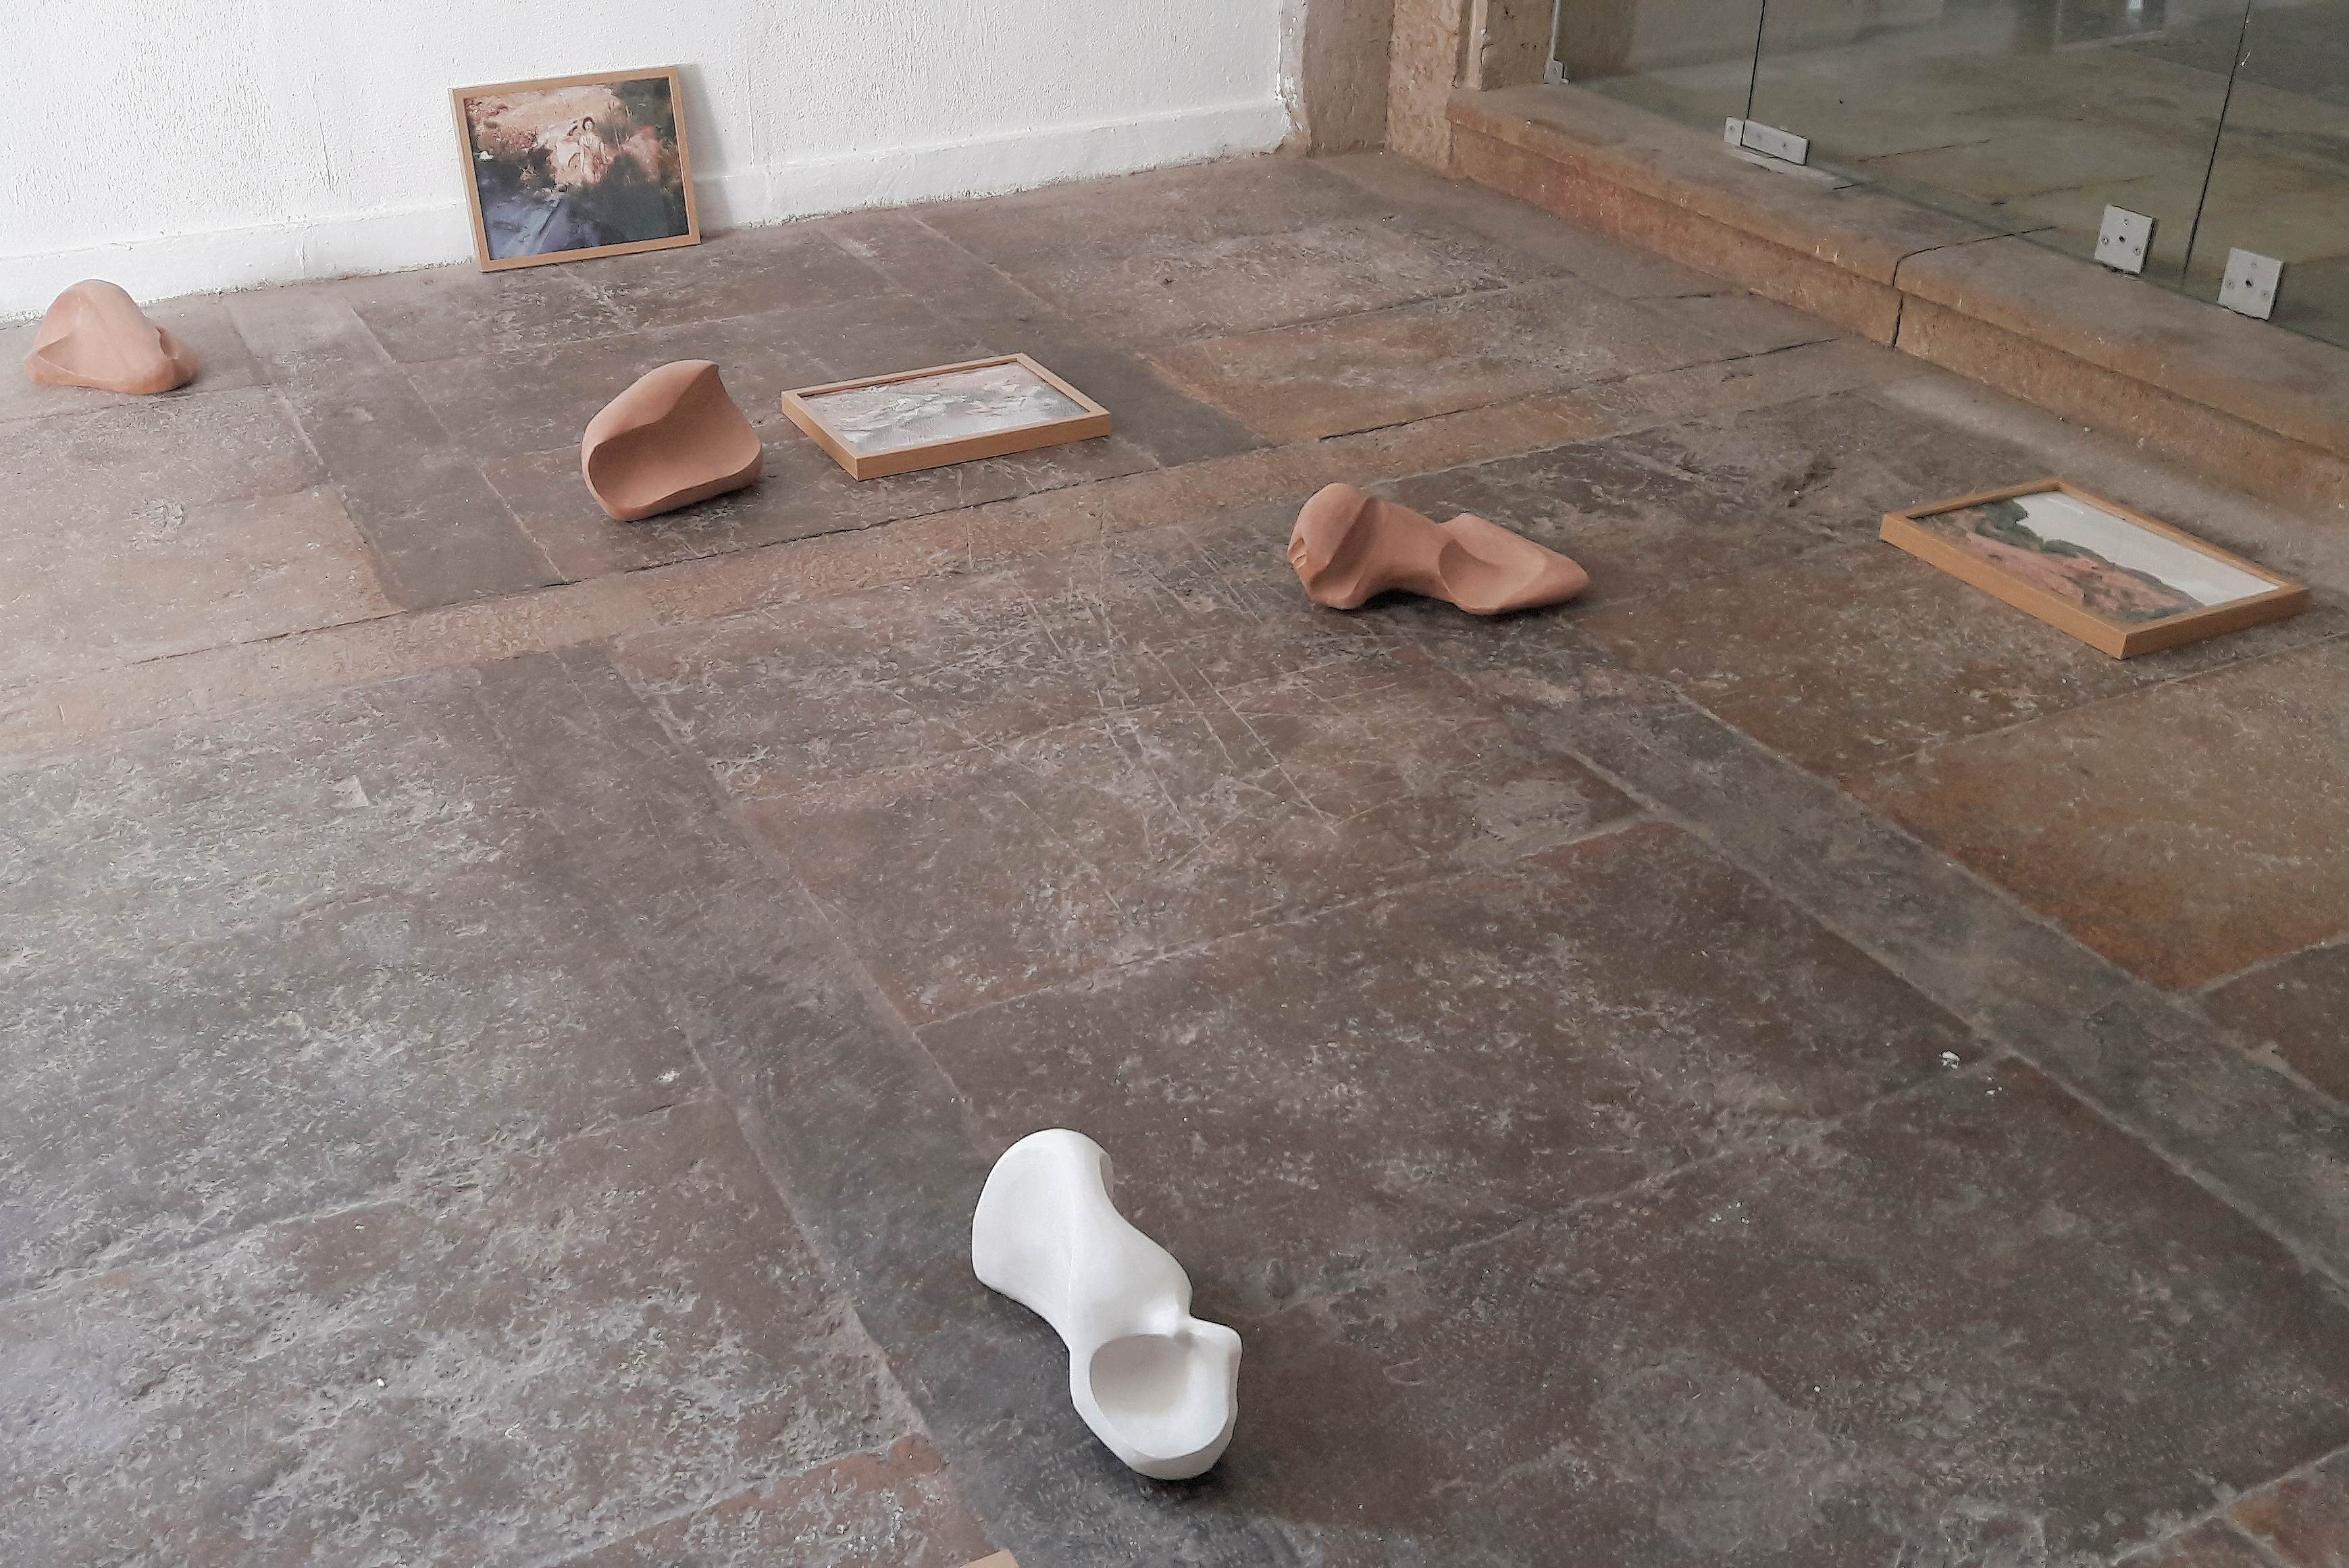 © Carla Souto, Installation view (Obstetra: que cuida Series), 2017